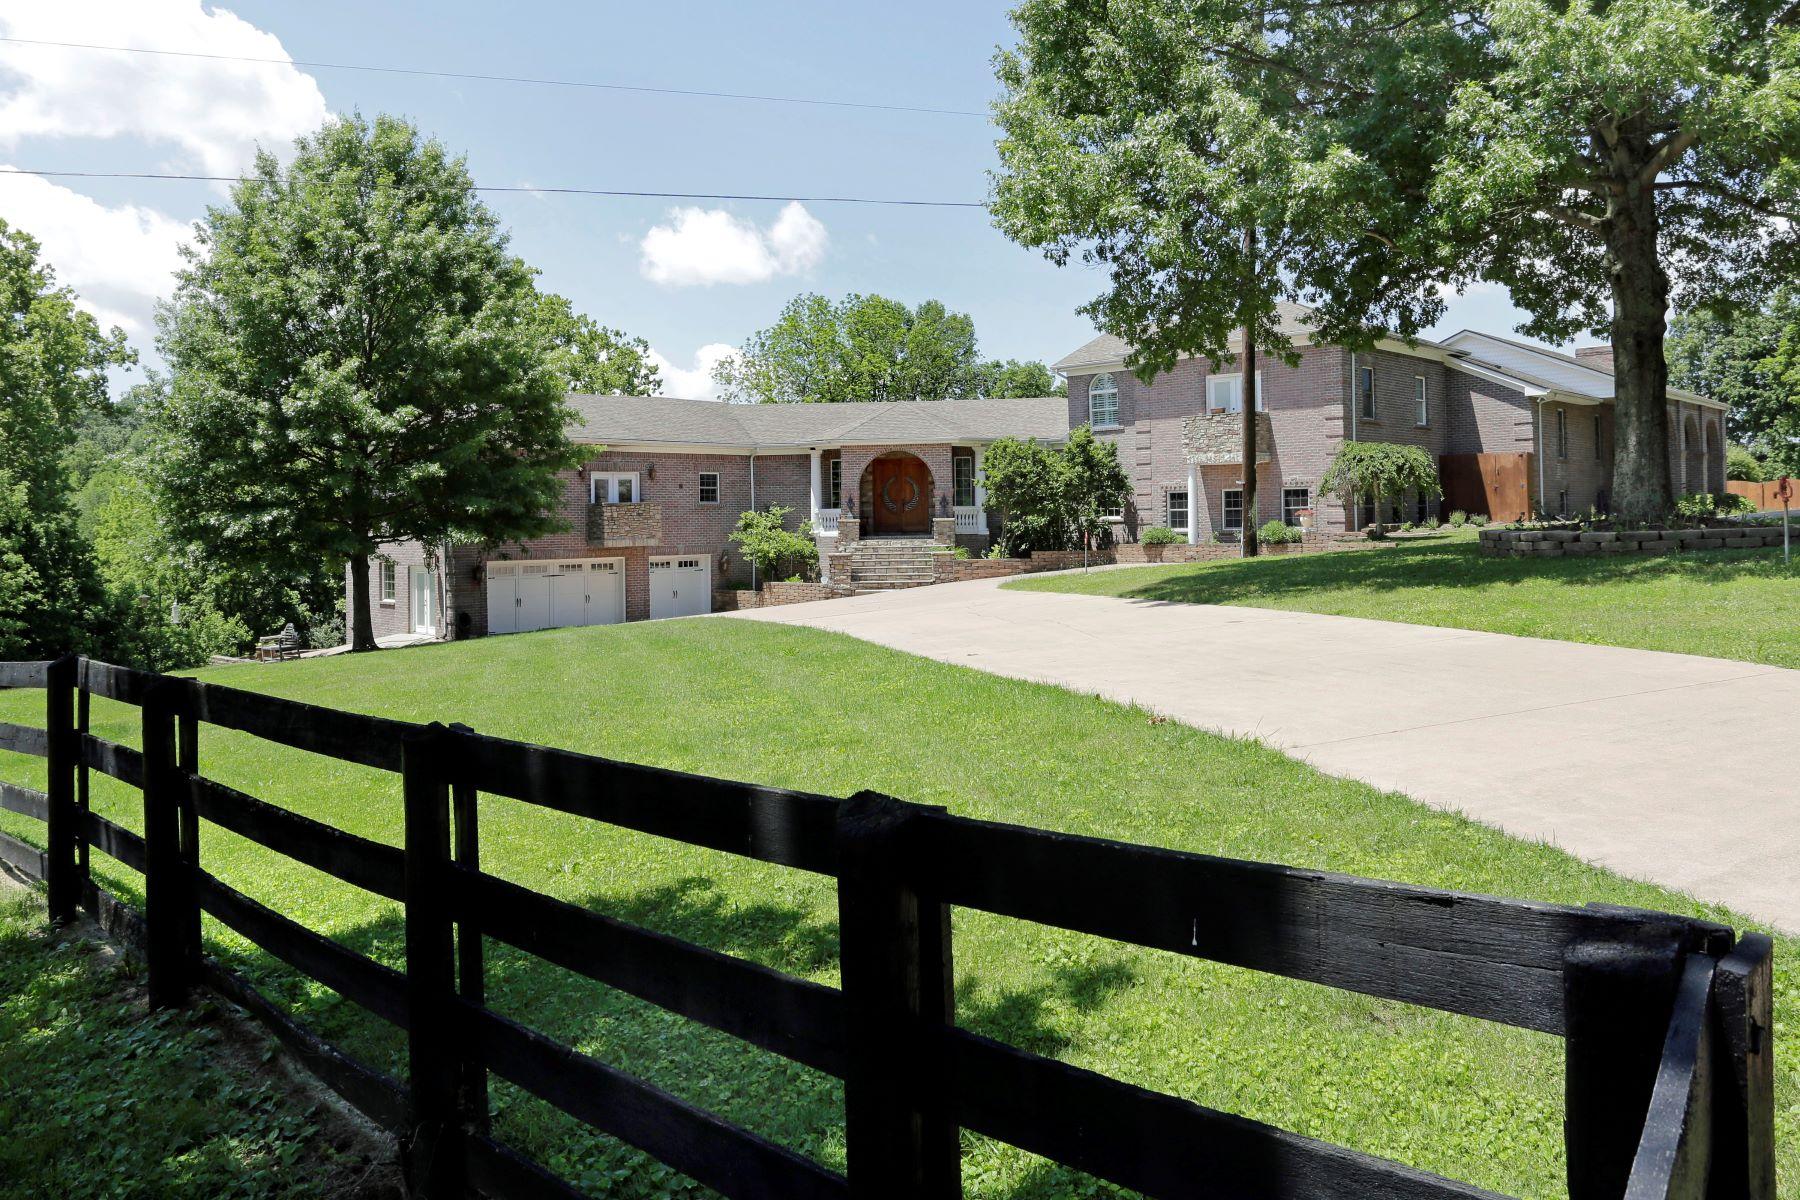 Single Family Home for Sale at 4950 Jennie Kate Lane Lexington, Kentucky, 40510 United States